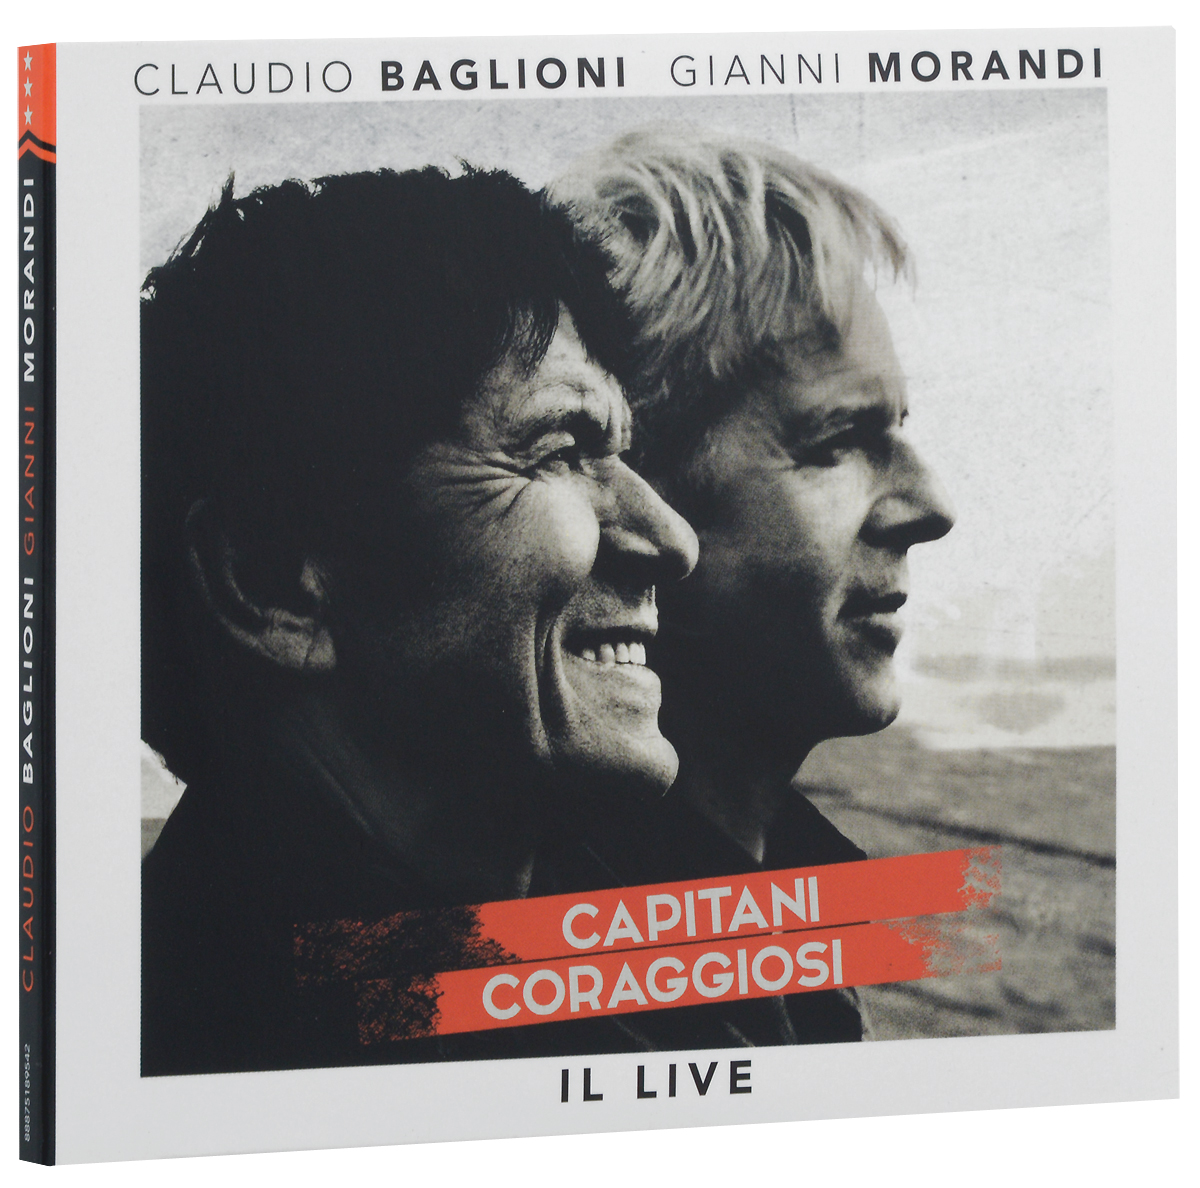 Claudio Baglioni. Gianni Morandi. Capitani Coraggiosi. Il Live (2 CD)